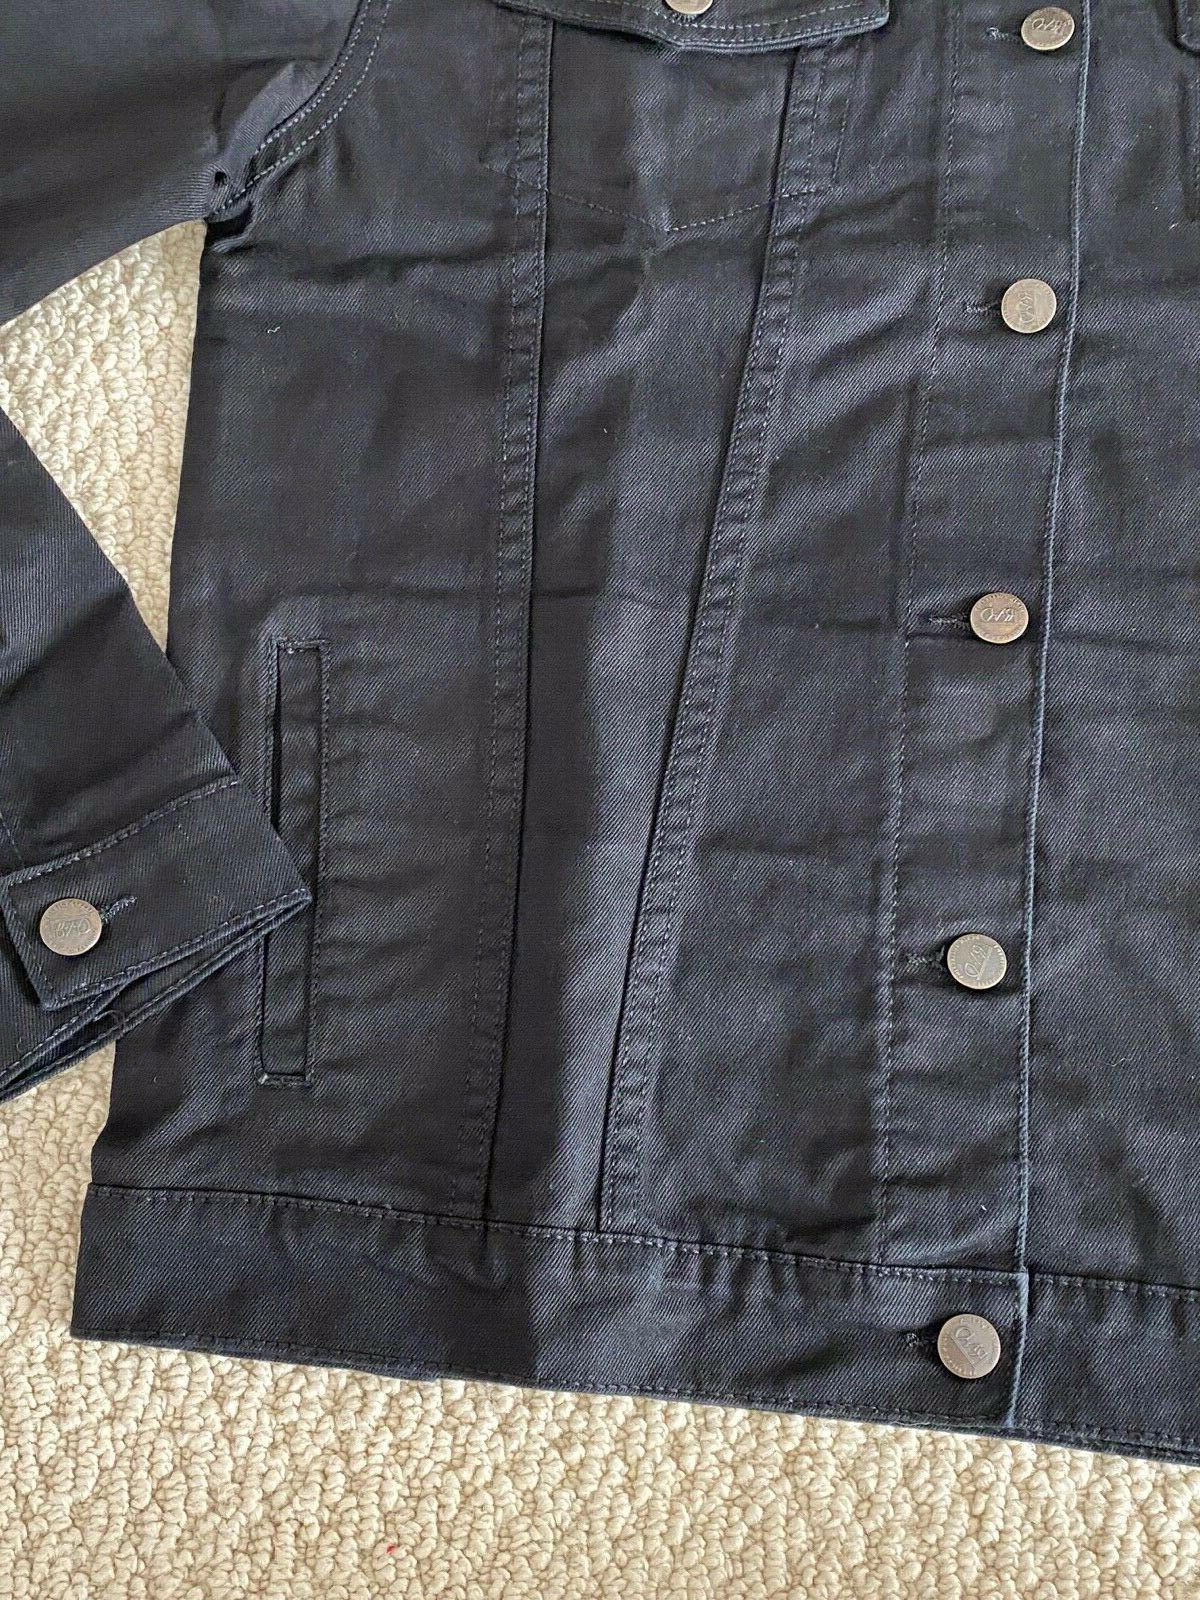 NWT Men's RND Denim Classic Black Denim Jean Jacket SIZES S-2XL